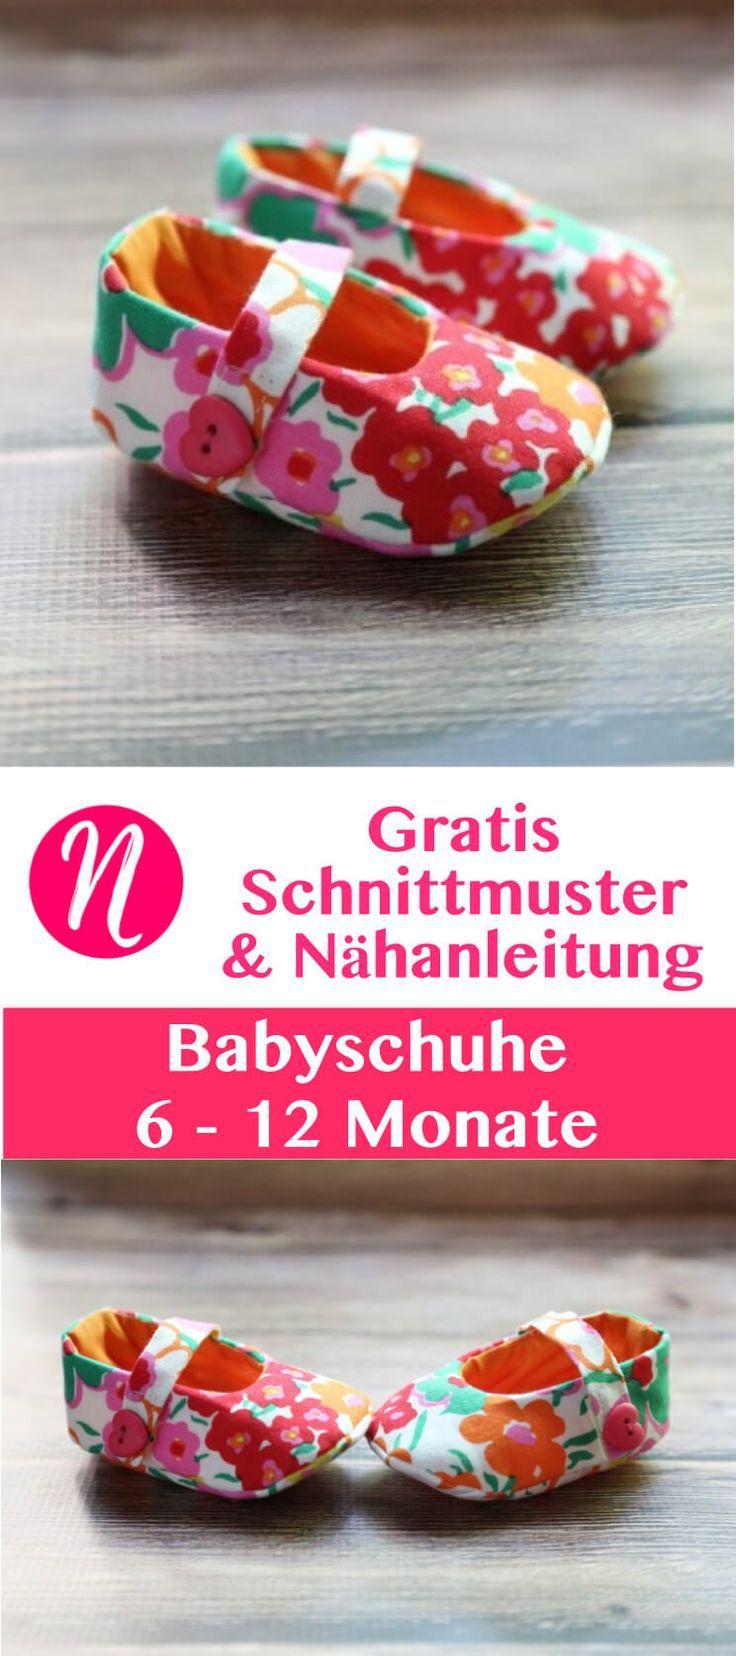 Babyschuhe Freebook - zum selber nähen - 6 - 12 Monate   Pinterest ...